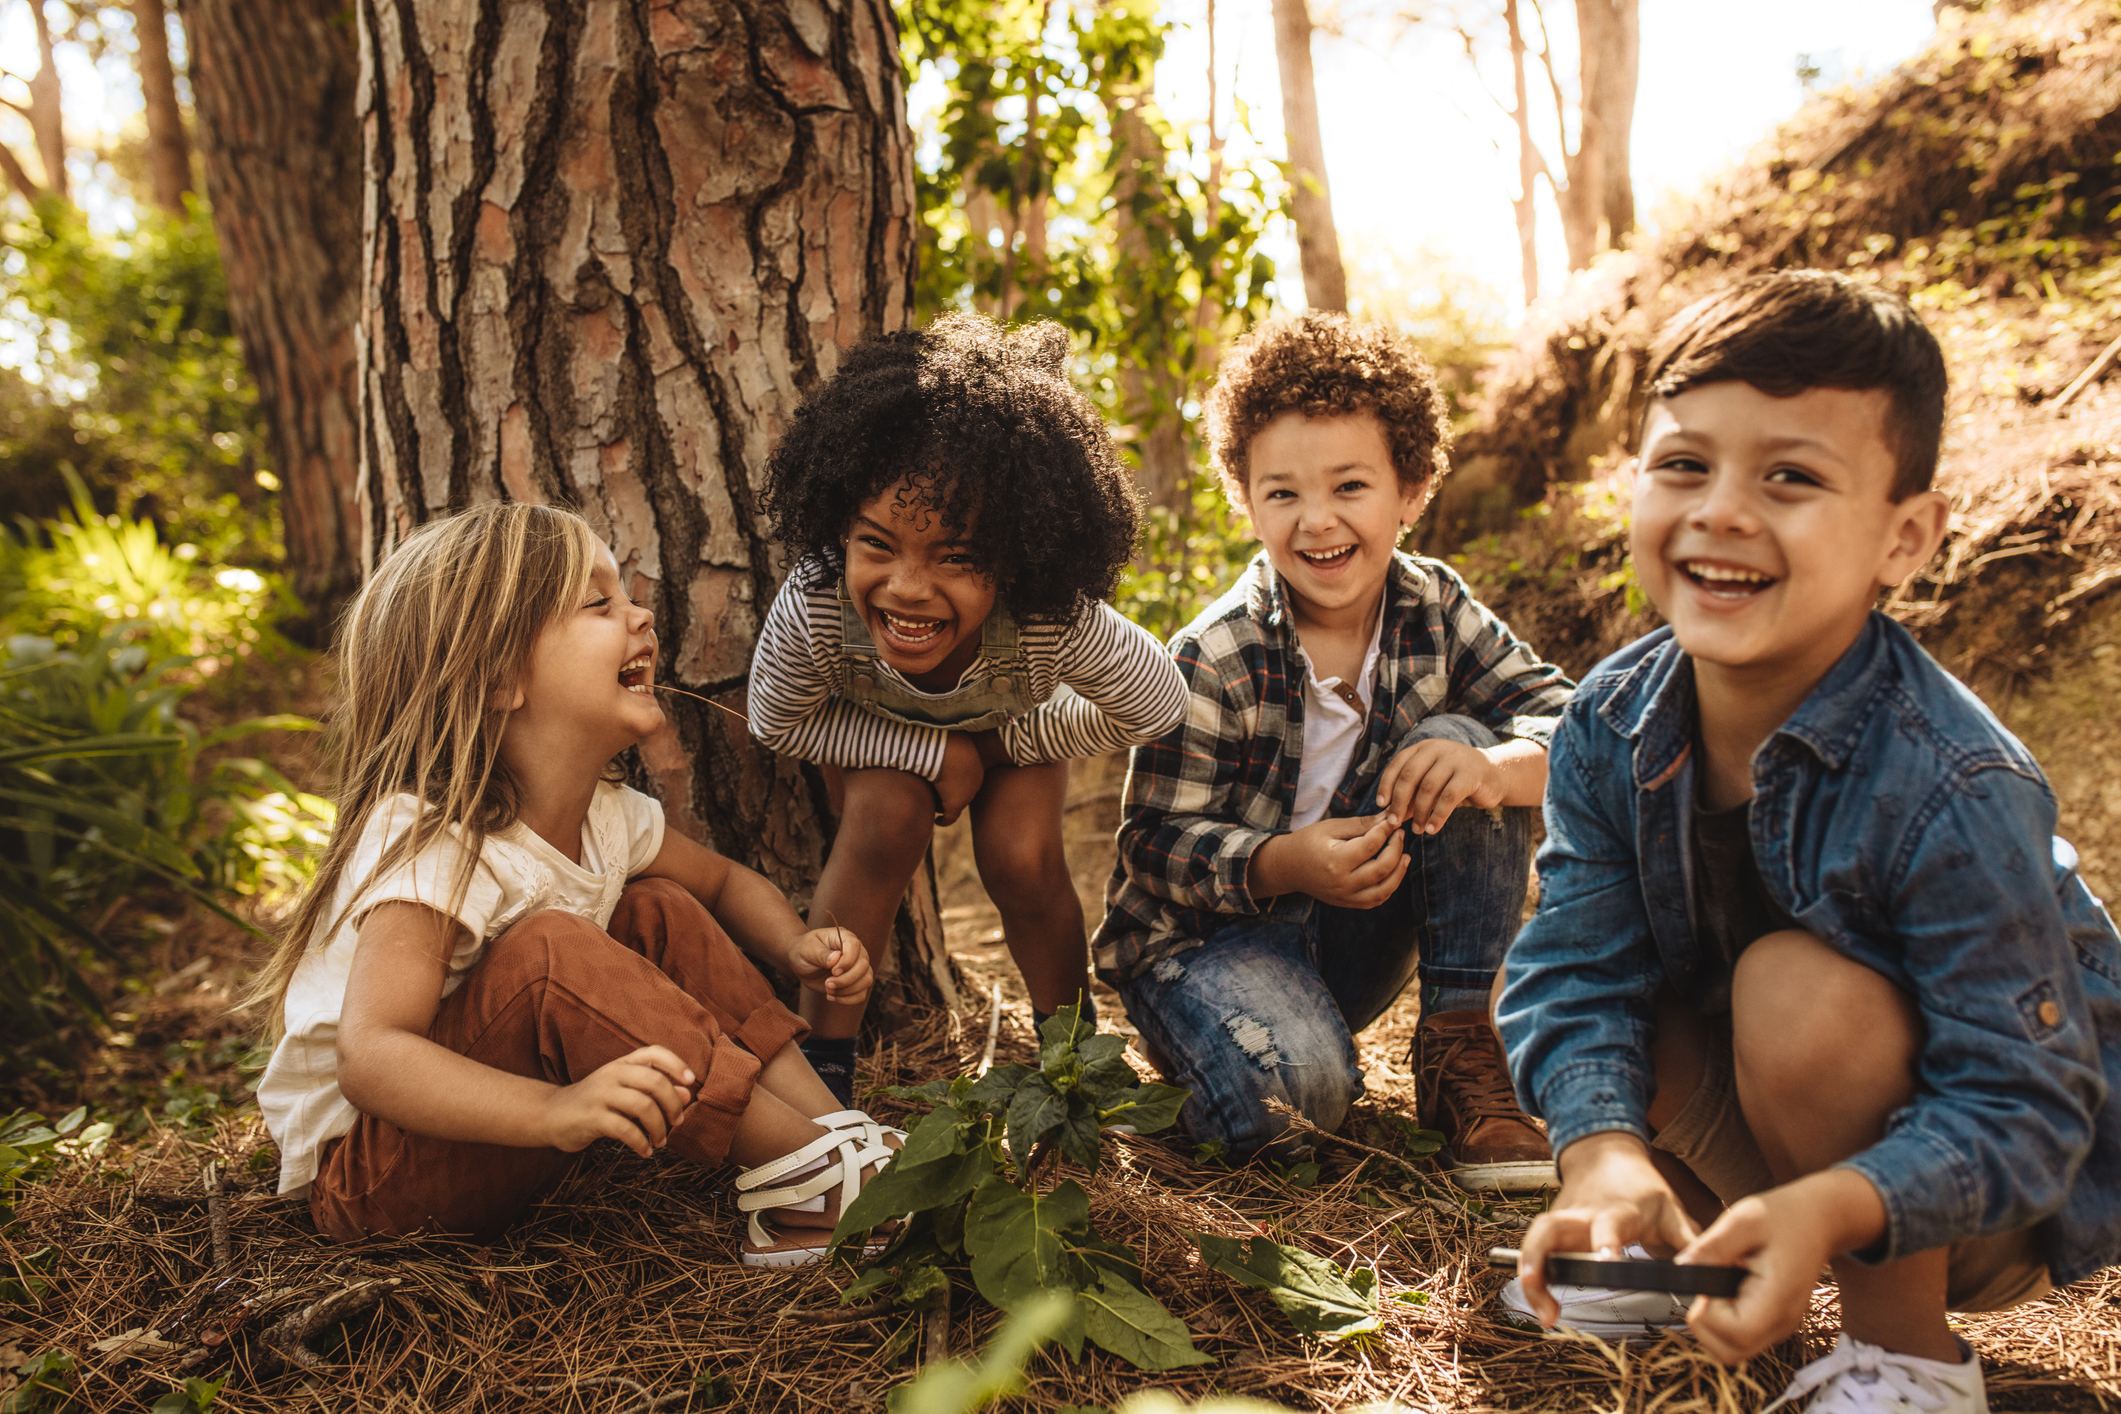 Barn som sitter i skogen.